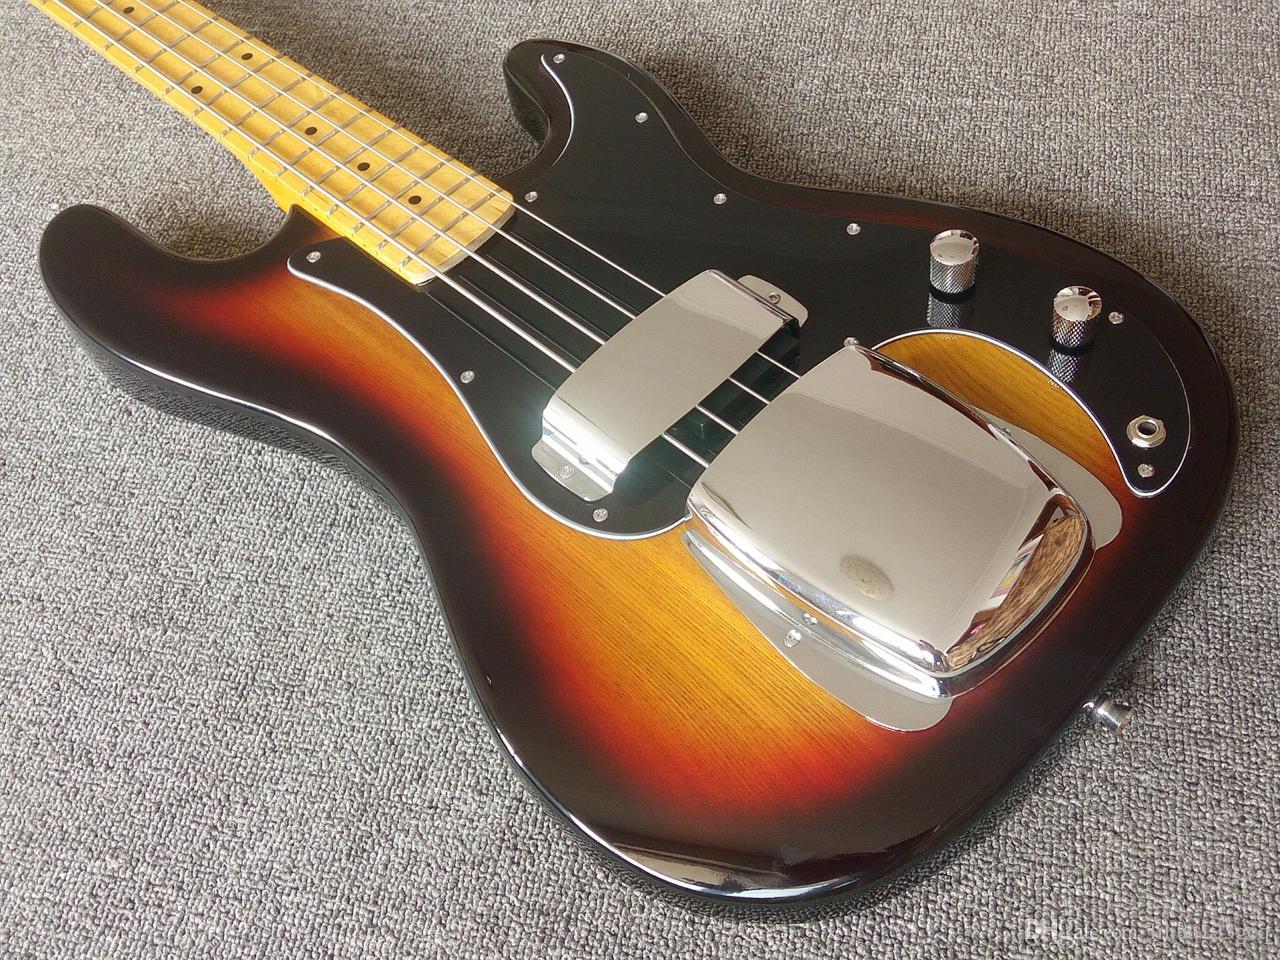 Bass Guitar Chords Top Quality 3 Tobacco Sunburst20 Frets4 Strings Pb Bassbridge Pickup Protection Steel Shieldmaple Neckelectric Bass Guitars